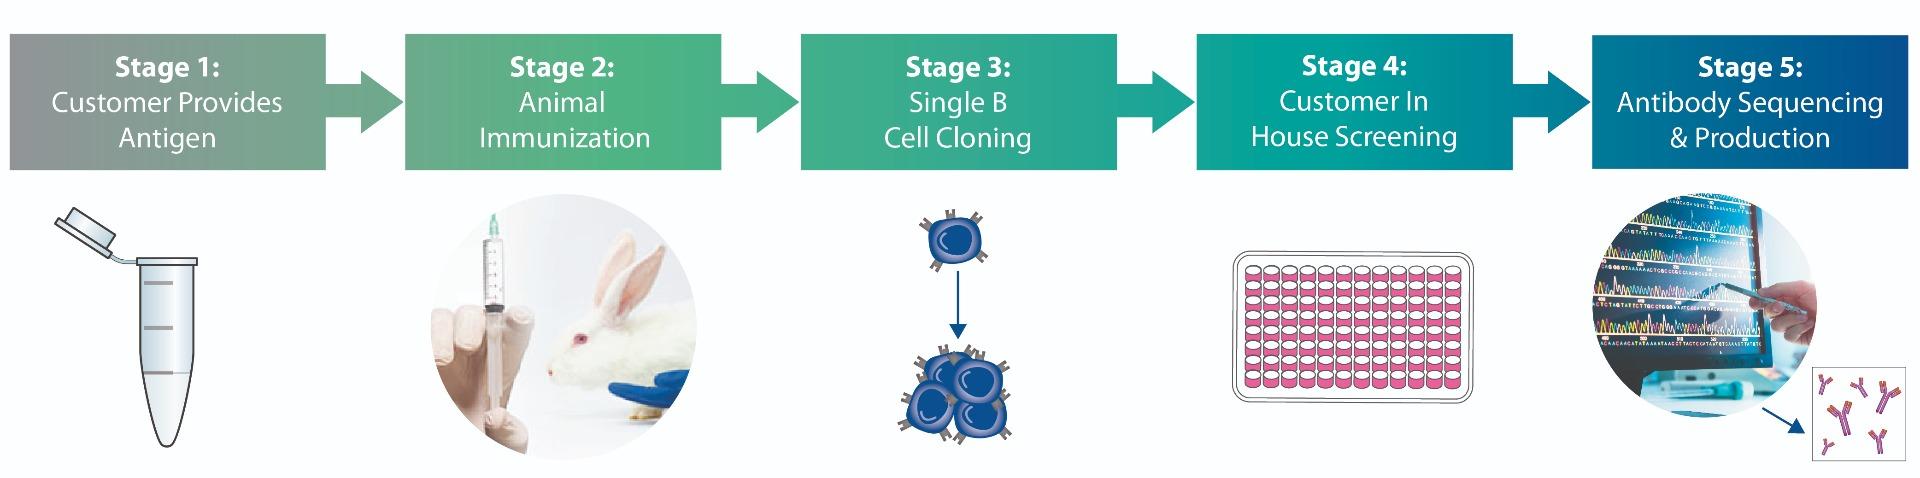 Rabbit Monoclonal Antibody Discovery Platform